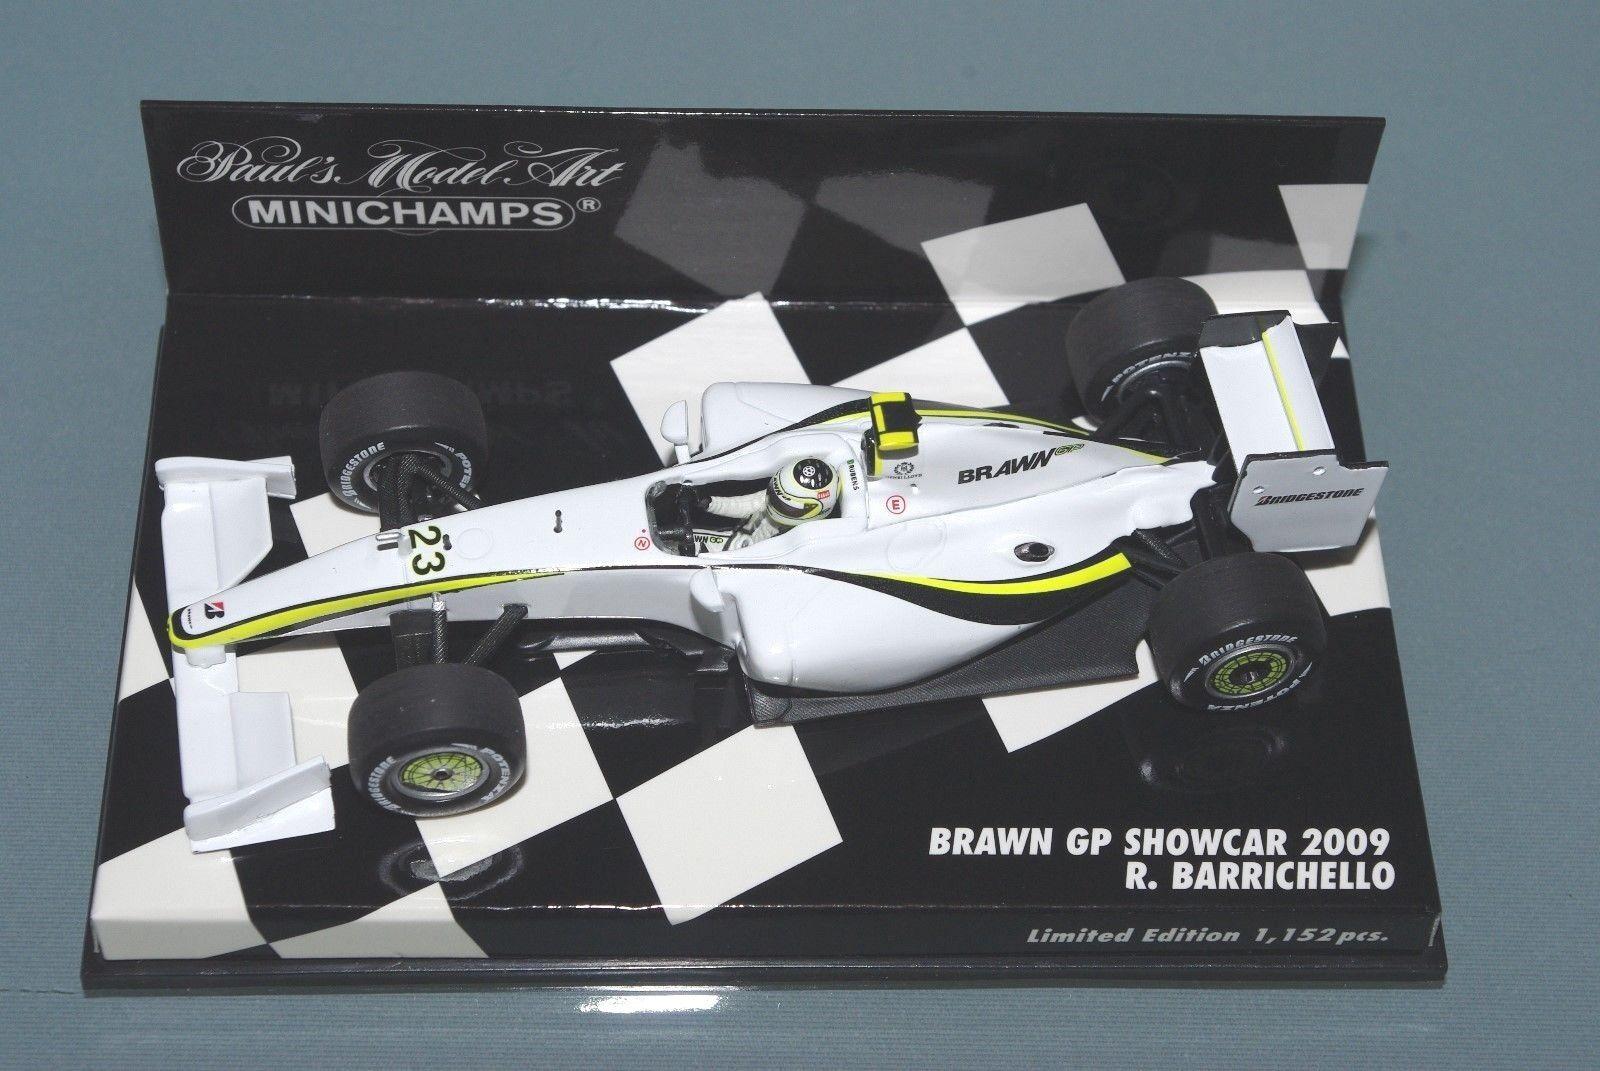 Minichamps F1 1 43 BRAWN GP SHOWCAR BARRICHELLO 2009 Limited Edition 1152pcs